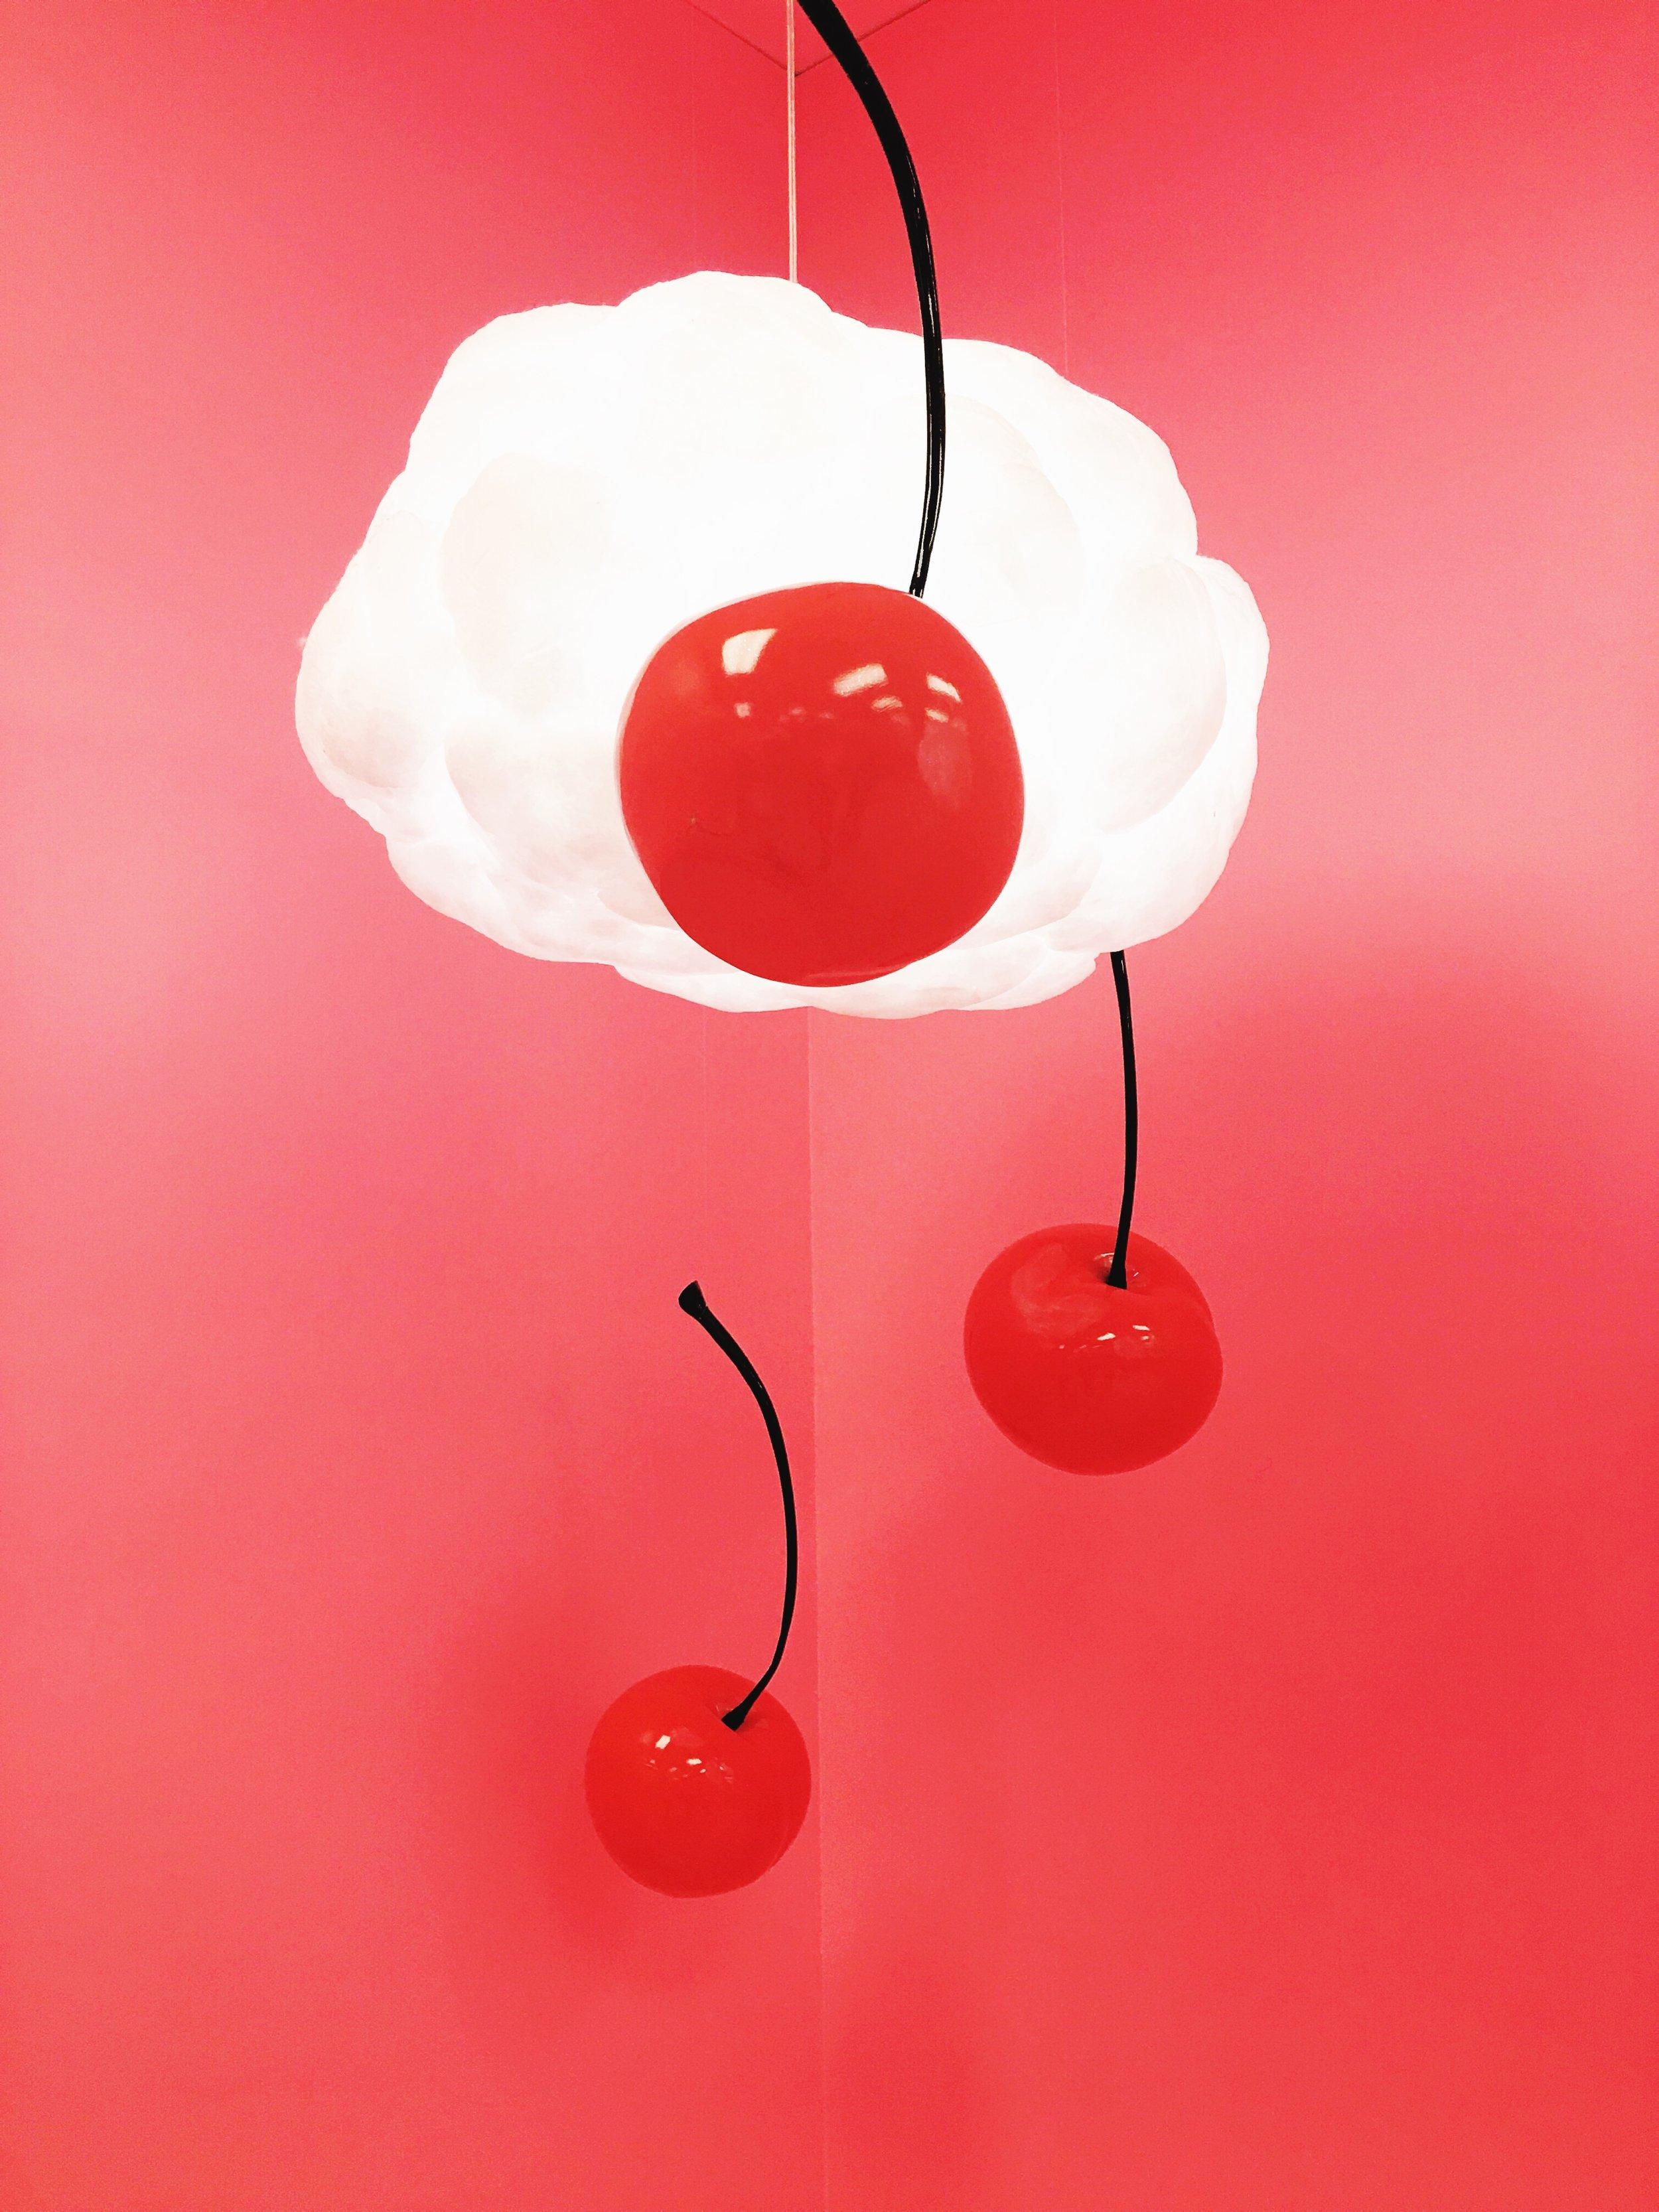 Cherries, clouds, Museum of ice cream